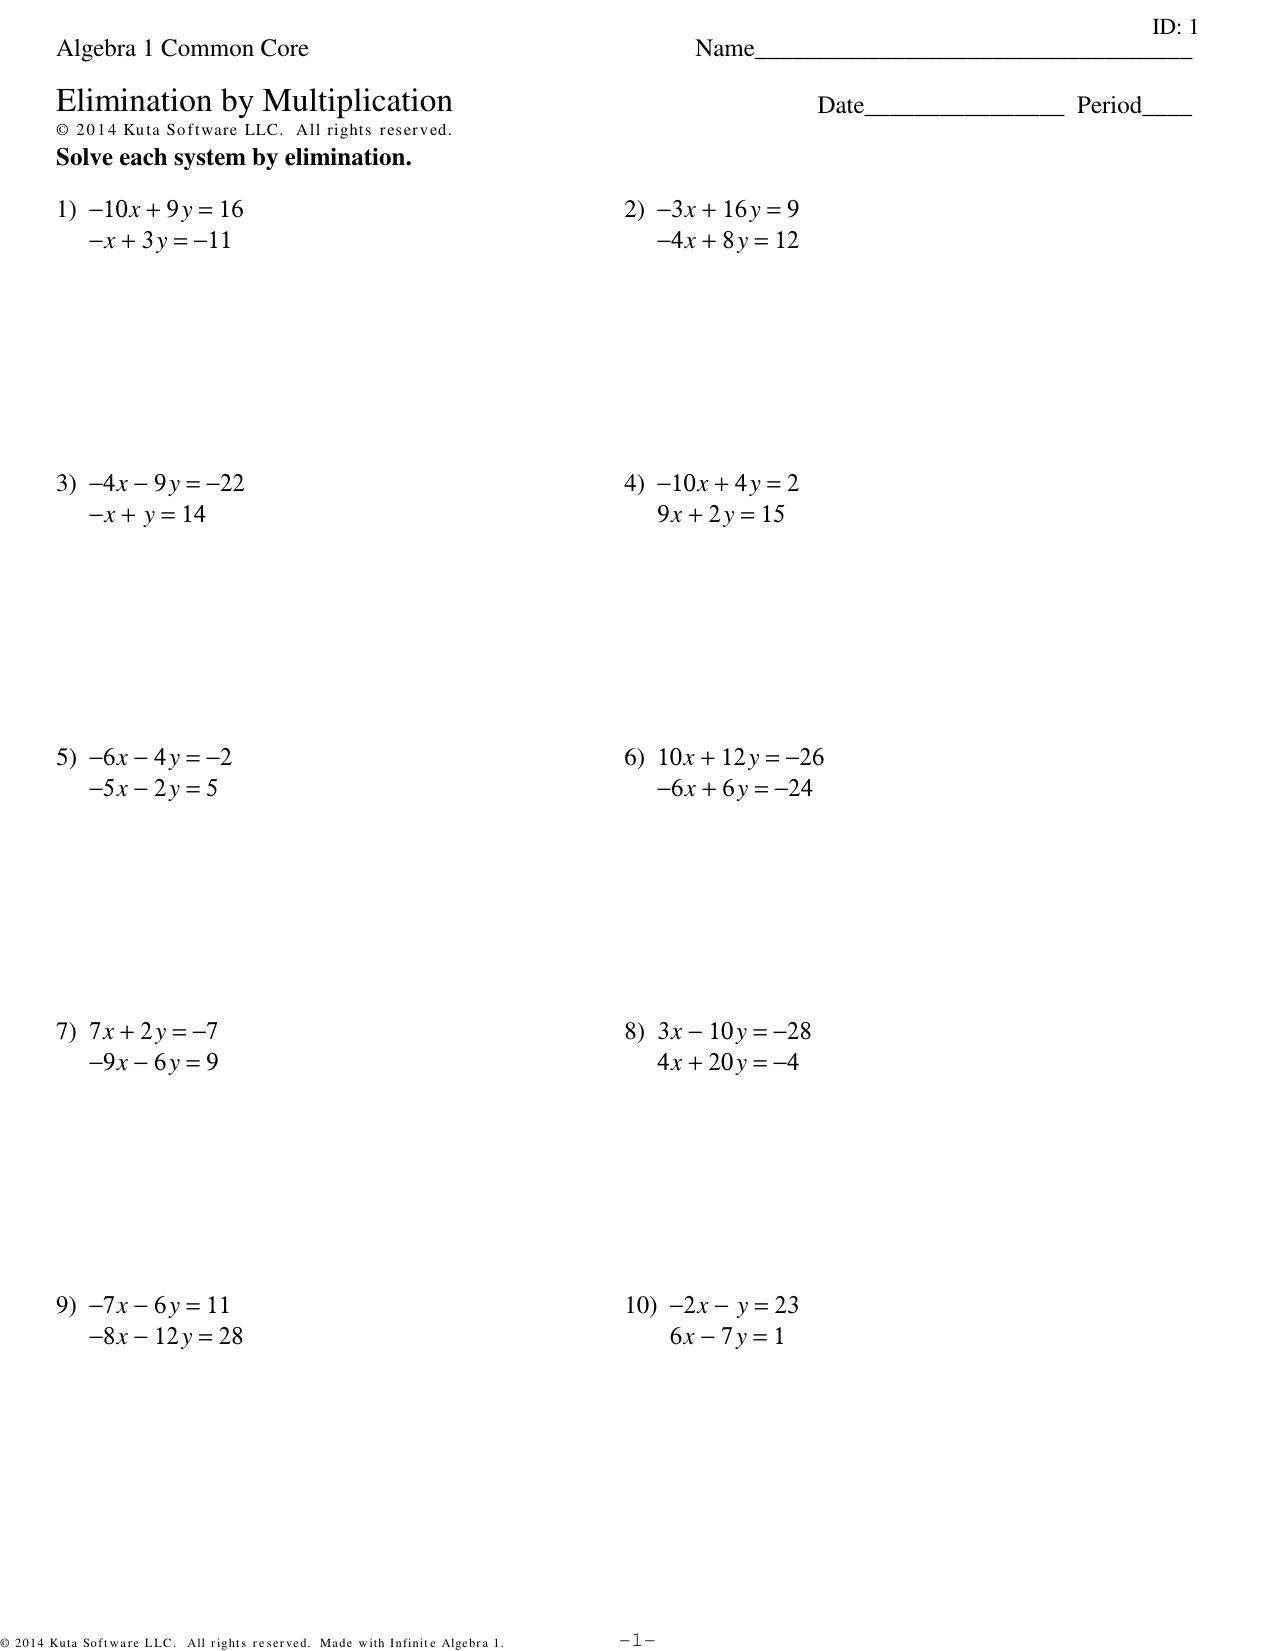 Algebra 1 Common Core - Elimination by Multiplication.ks-ia1